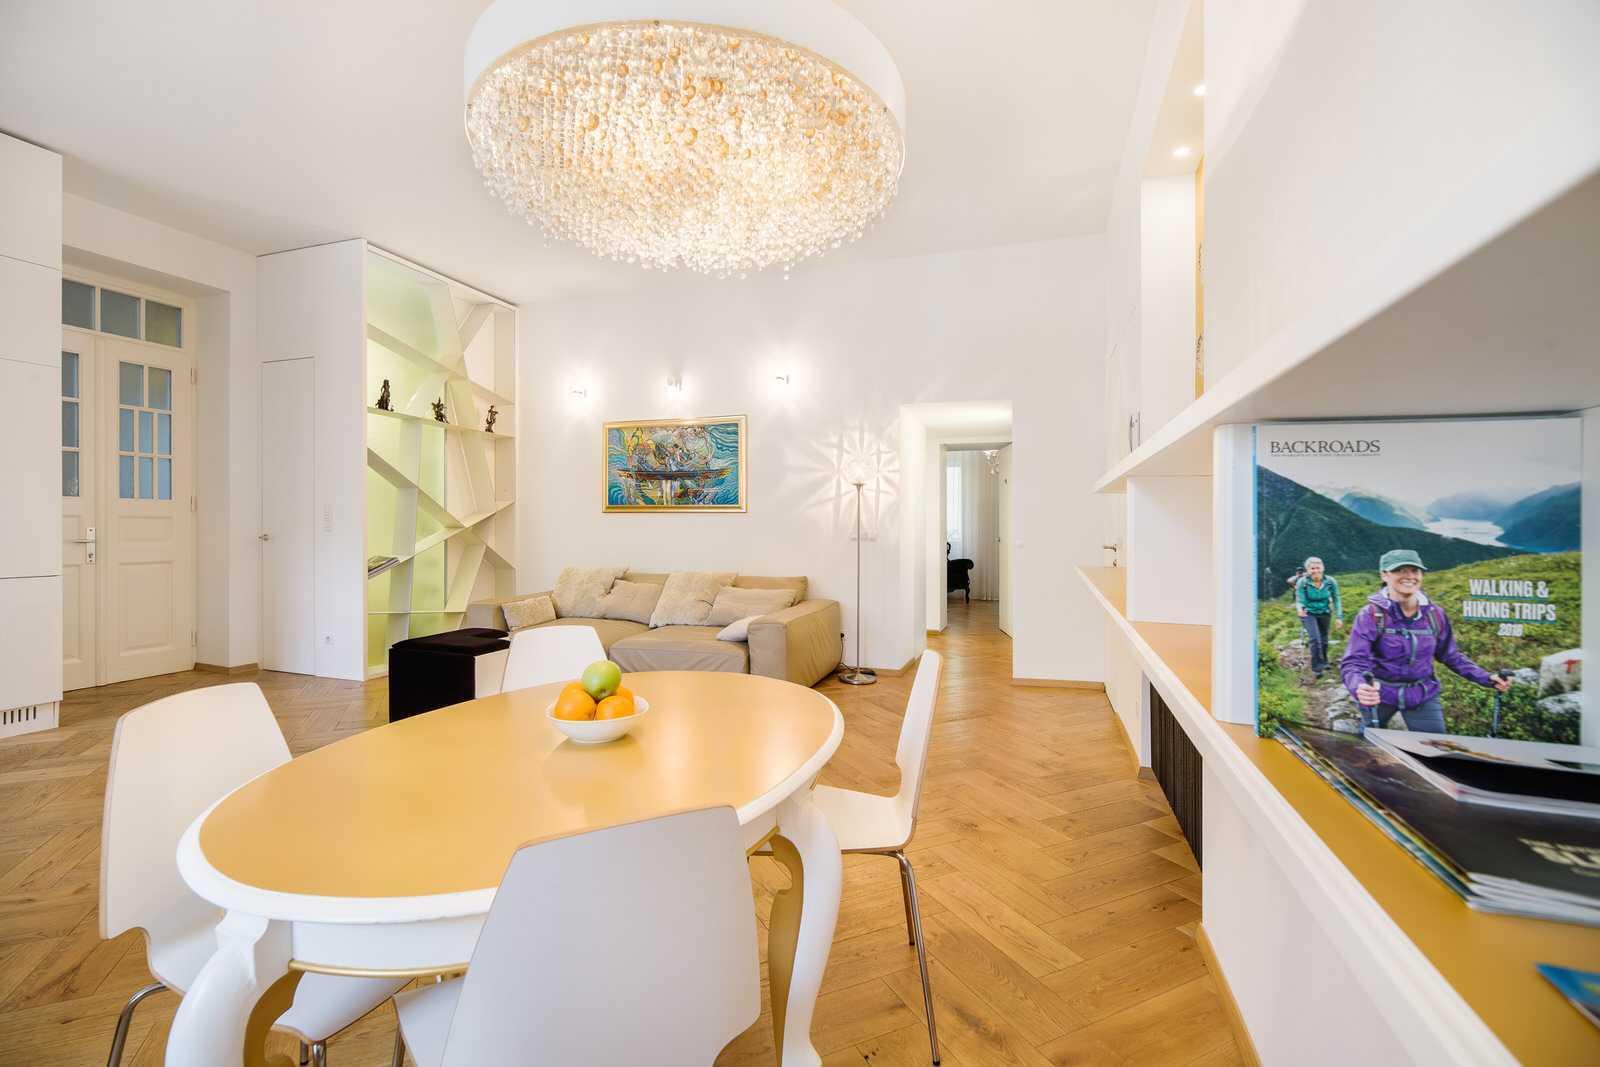 Ljubljana 2-bedroom Beethovnova apartment's dining table